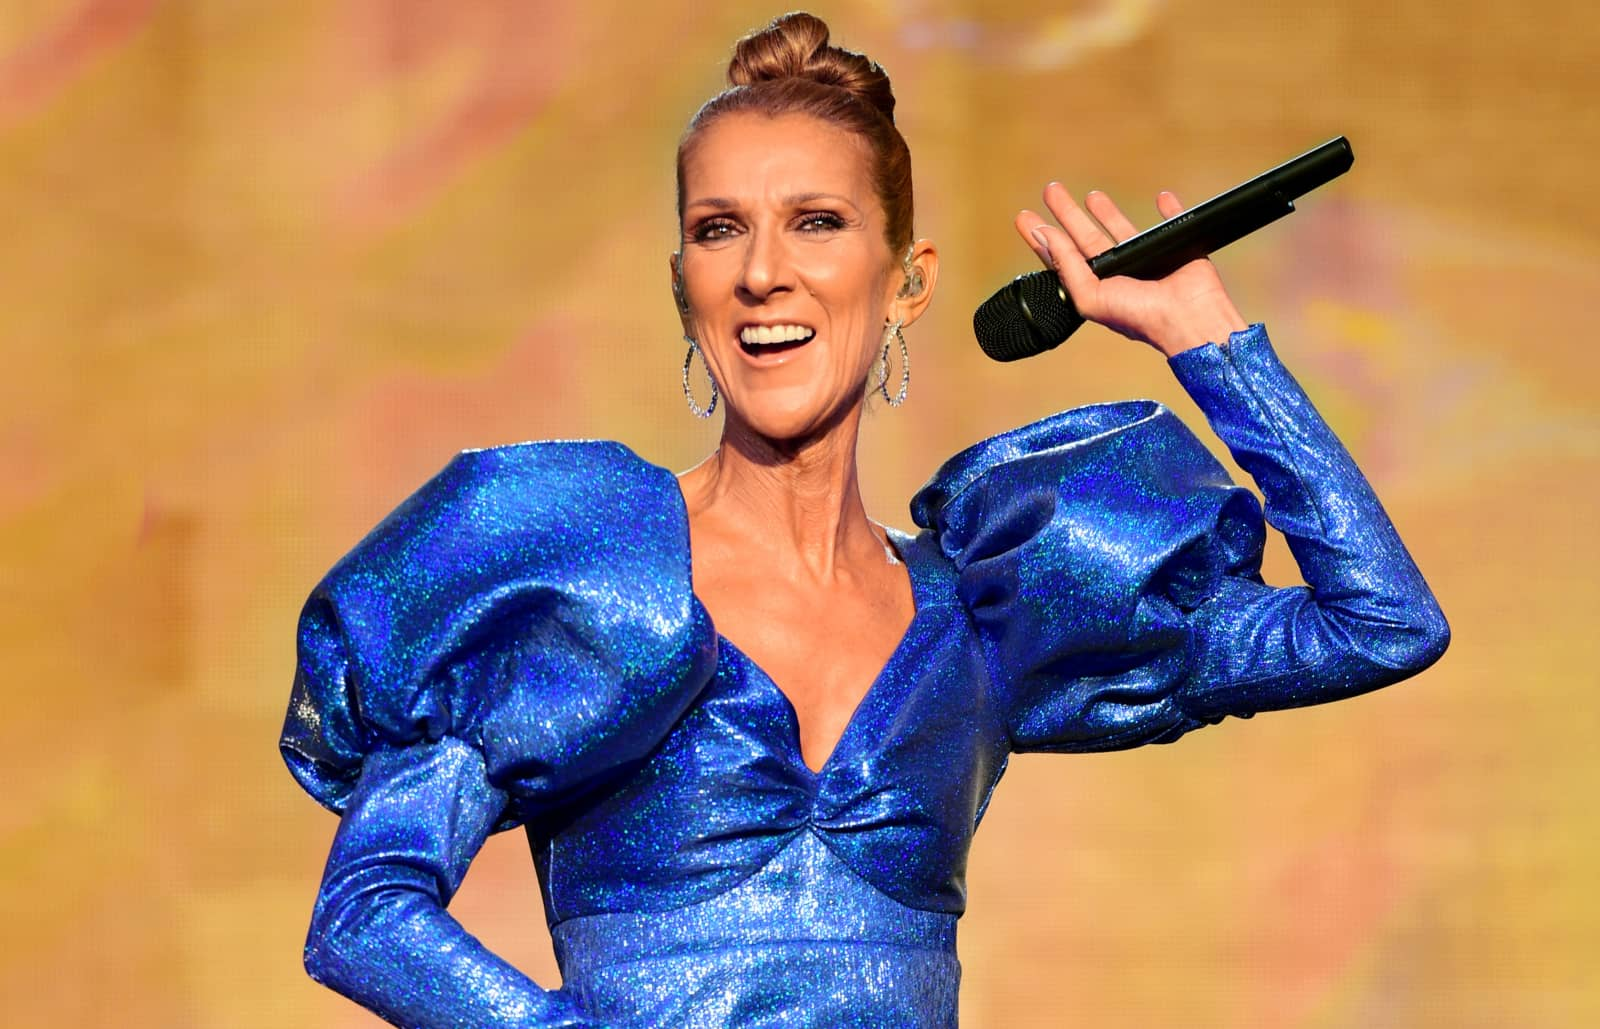 Celine Dion Zagreb Tickets Arena Zagreb 22 5 2021 Stubhub Uk